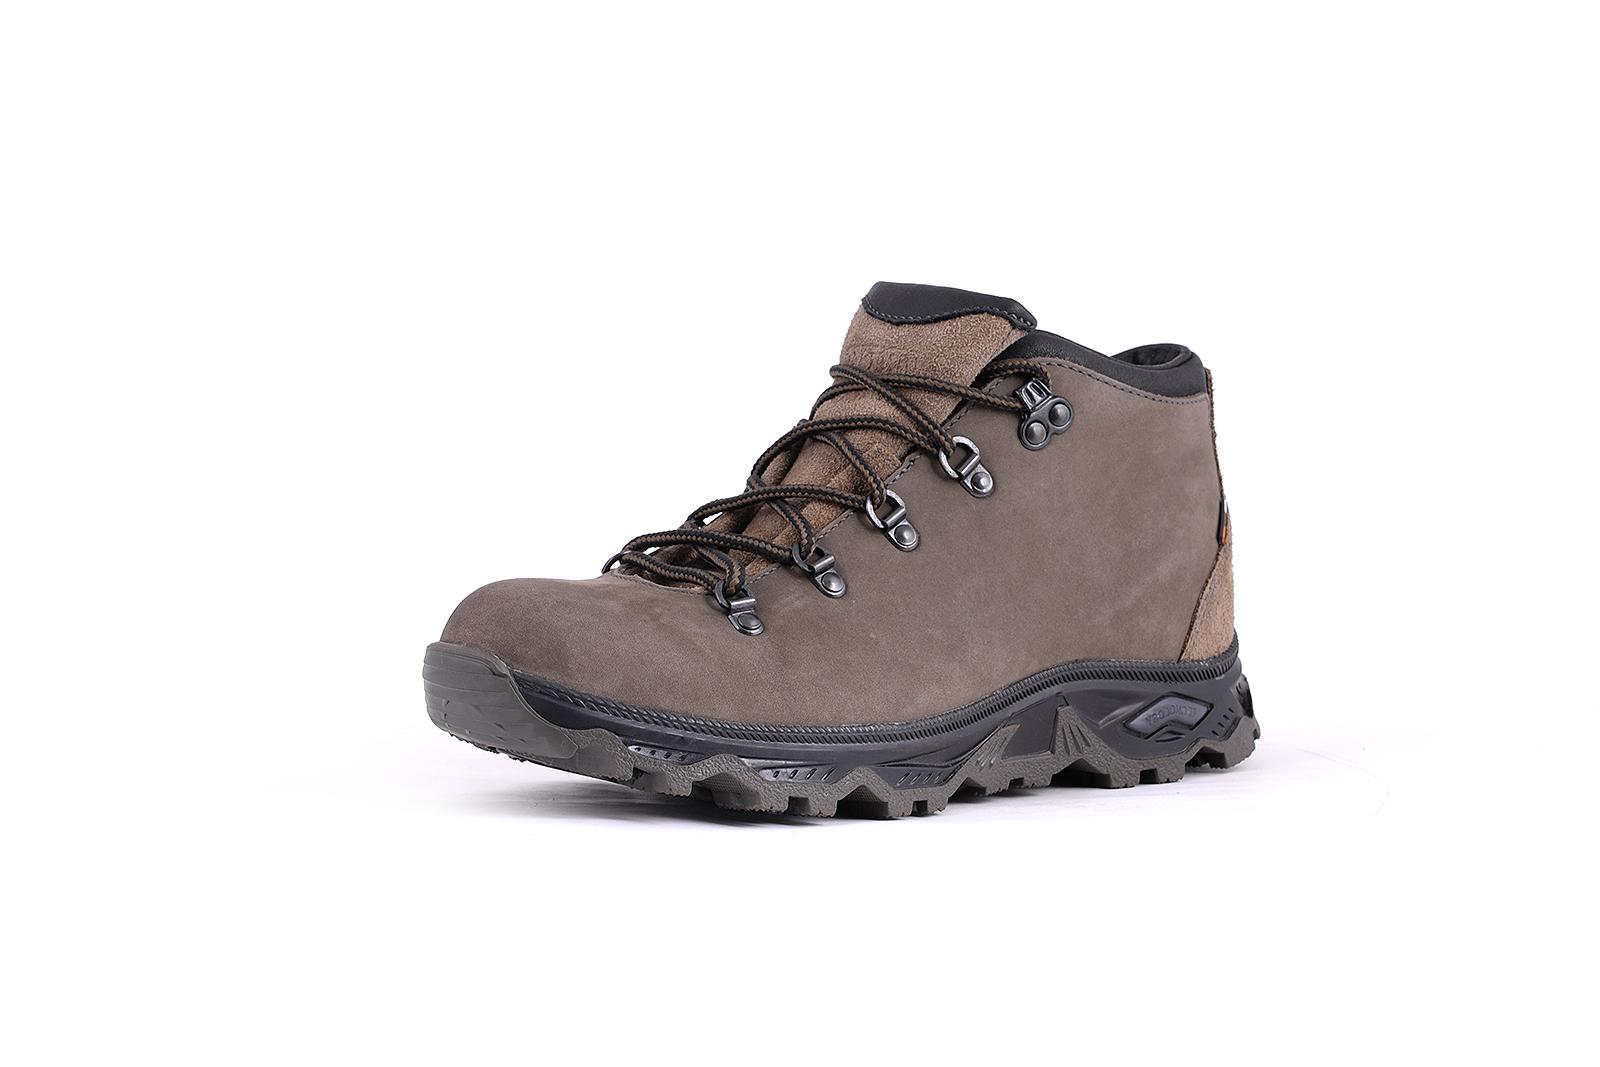 Ботинки мужские TREK Andes4 (капровелюр), Ботинки - арт. 1129410177